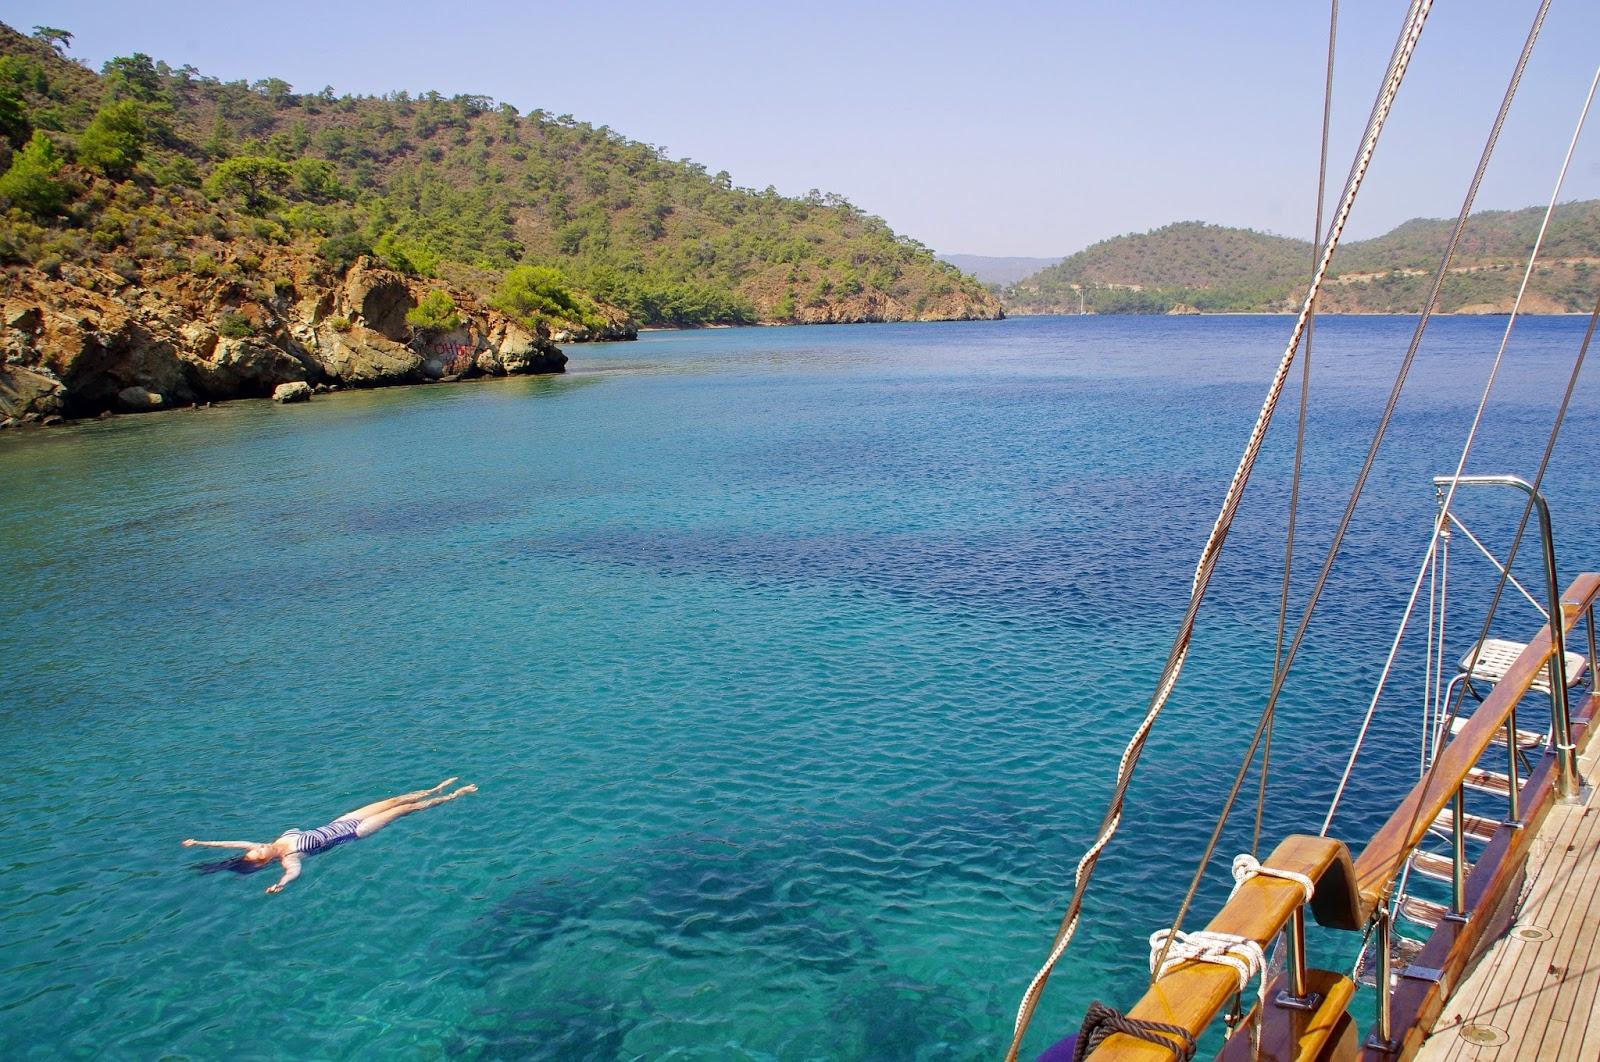 Floating in Crystal Clear Water in Turkey